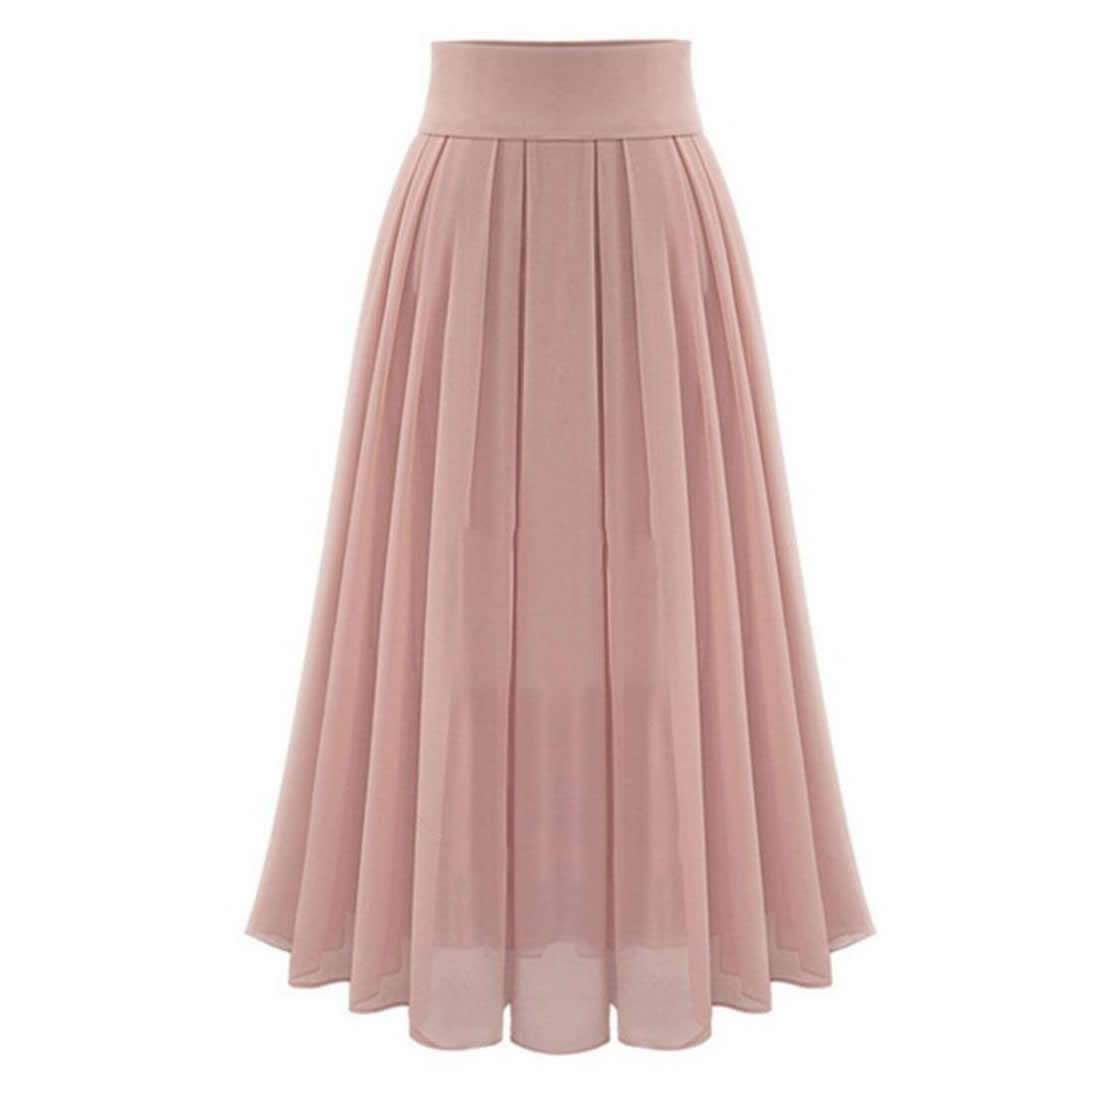 Chiffon Summer Skirt Sweet Solid Pink Women Boho 2018 Faldas High Waist Pleated Long Skirts Womens Maxi Chiffon Skirt